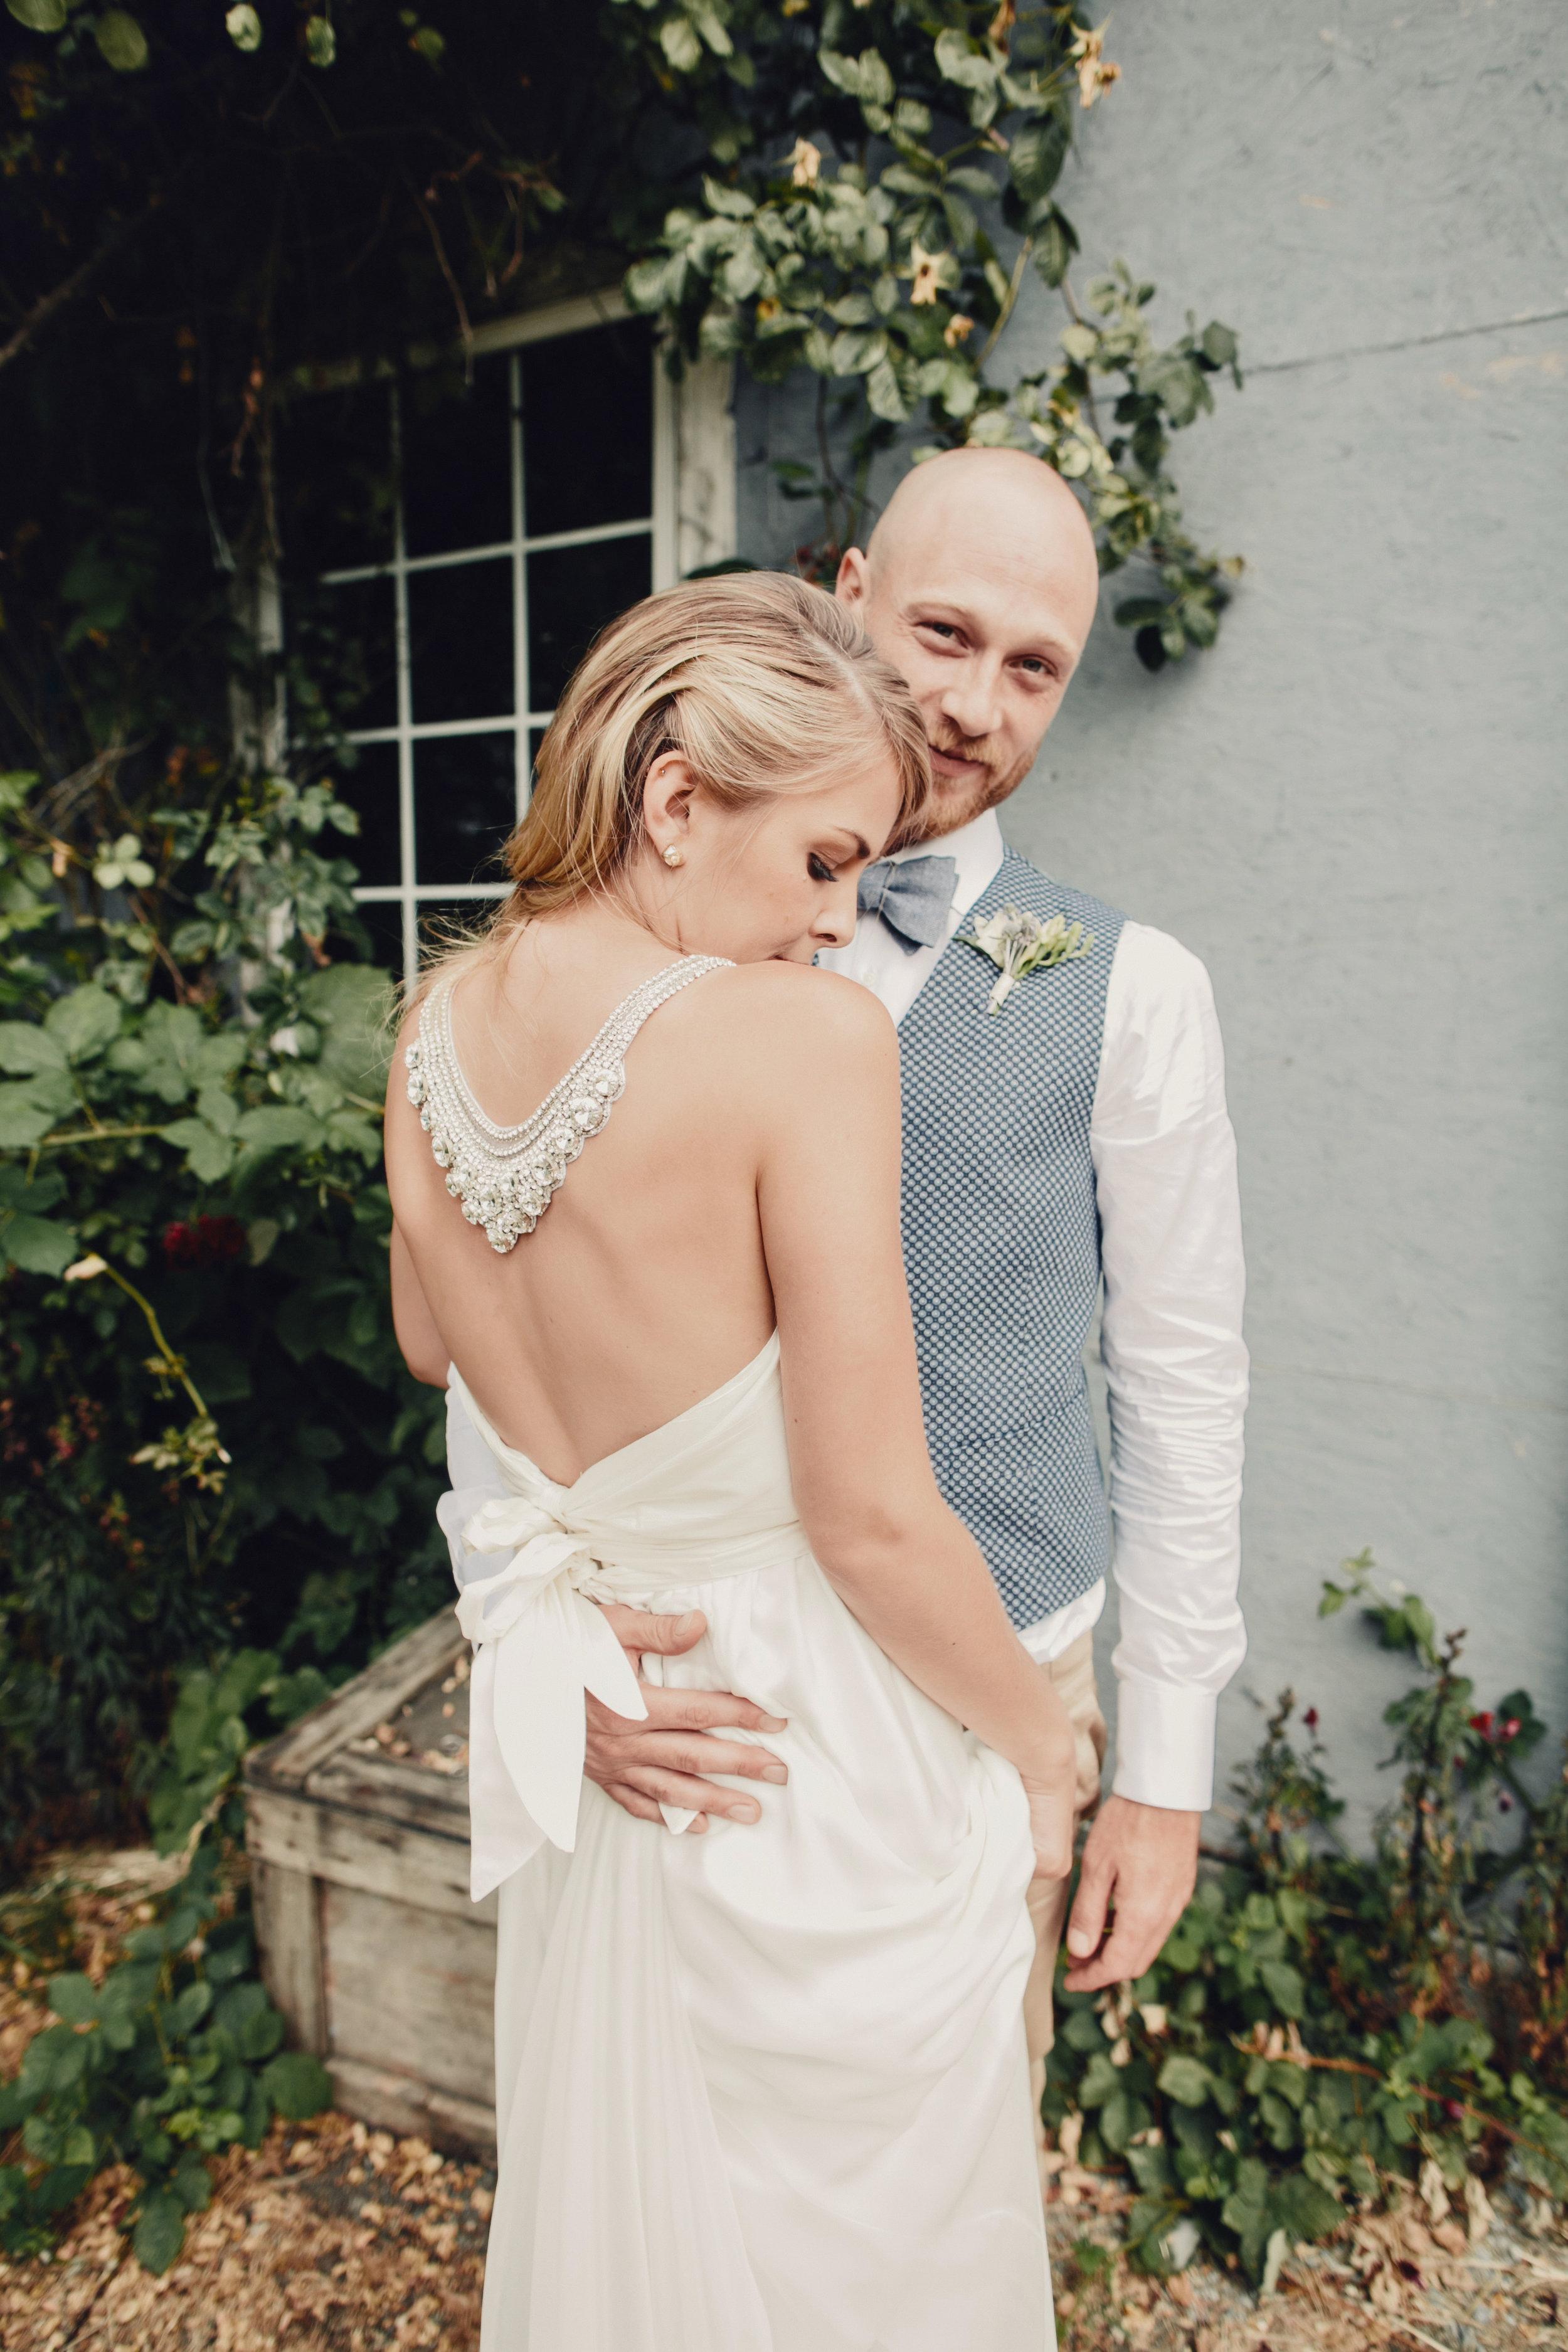 kildara-farms-wedding-photo-inspiration-0070